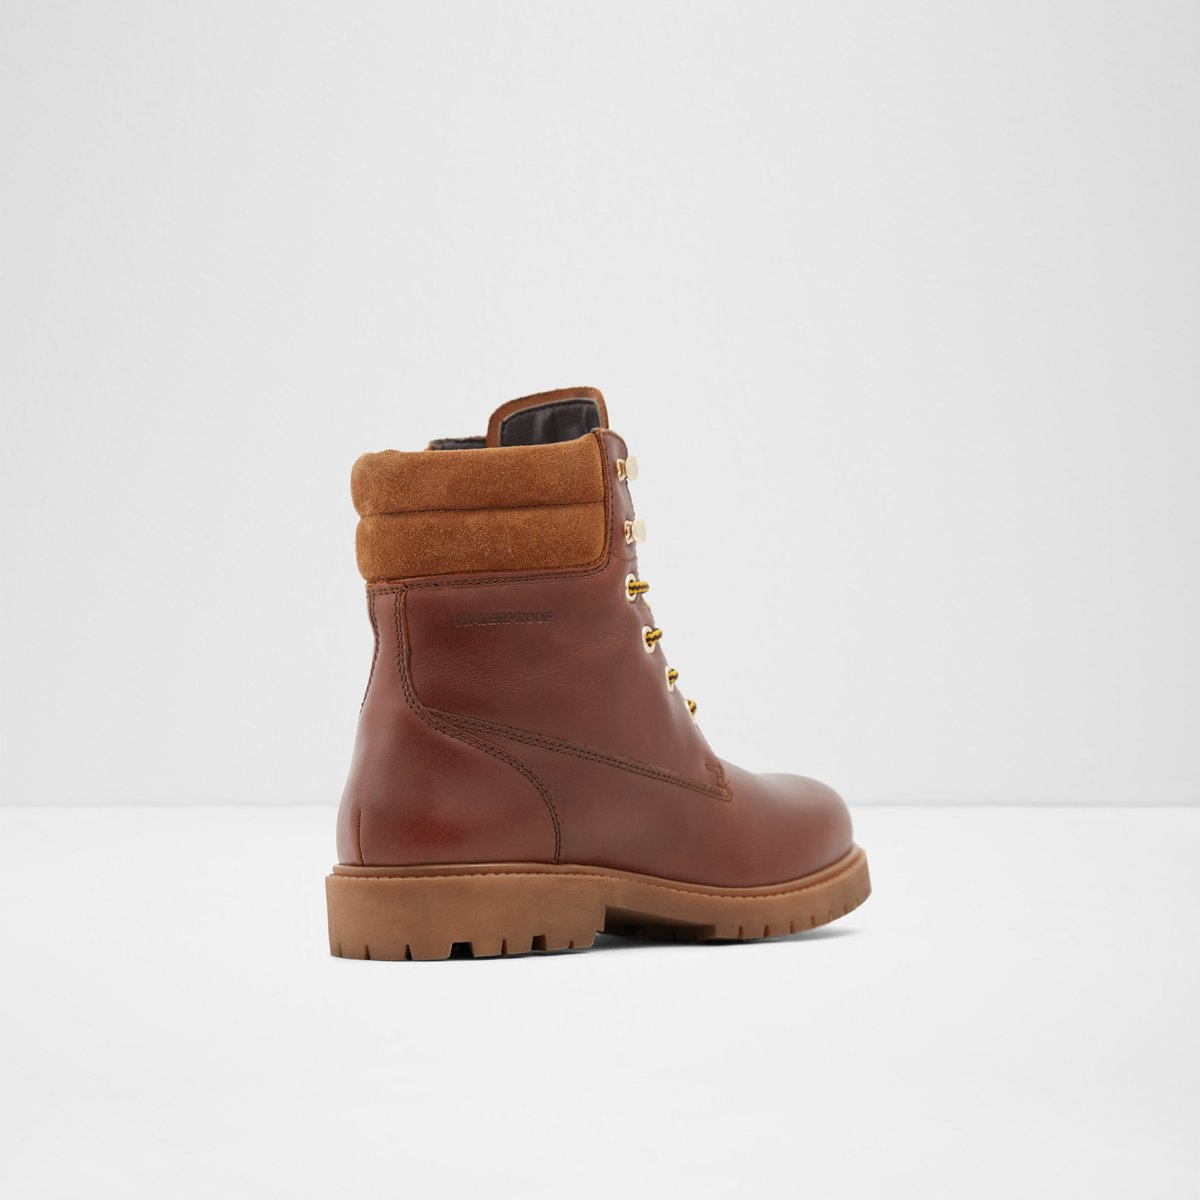 Prendalind Cognac Women's Ankle boots